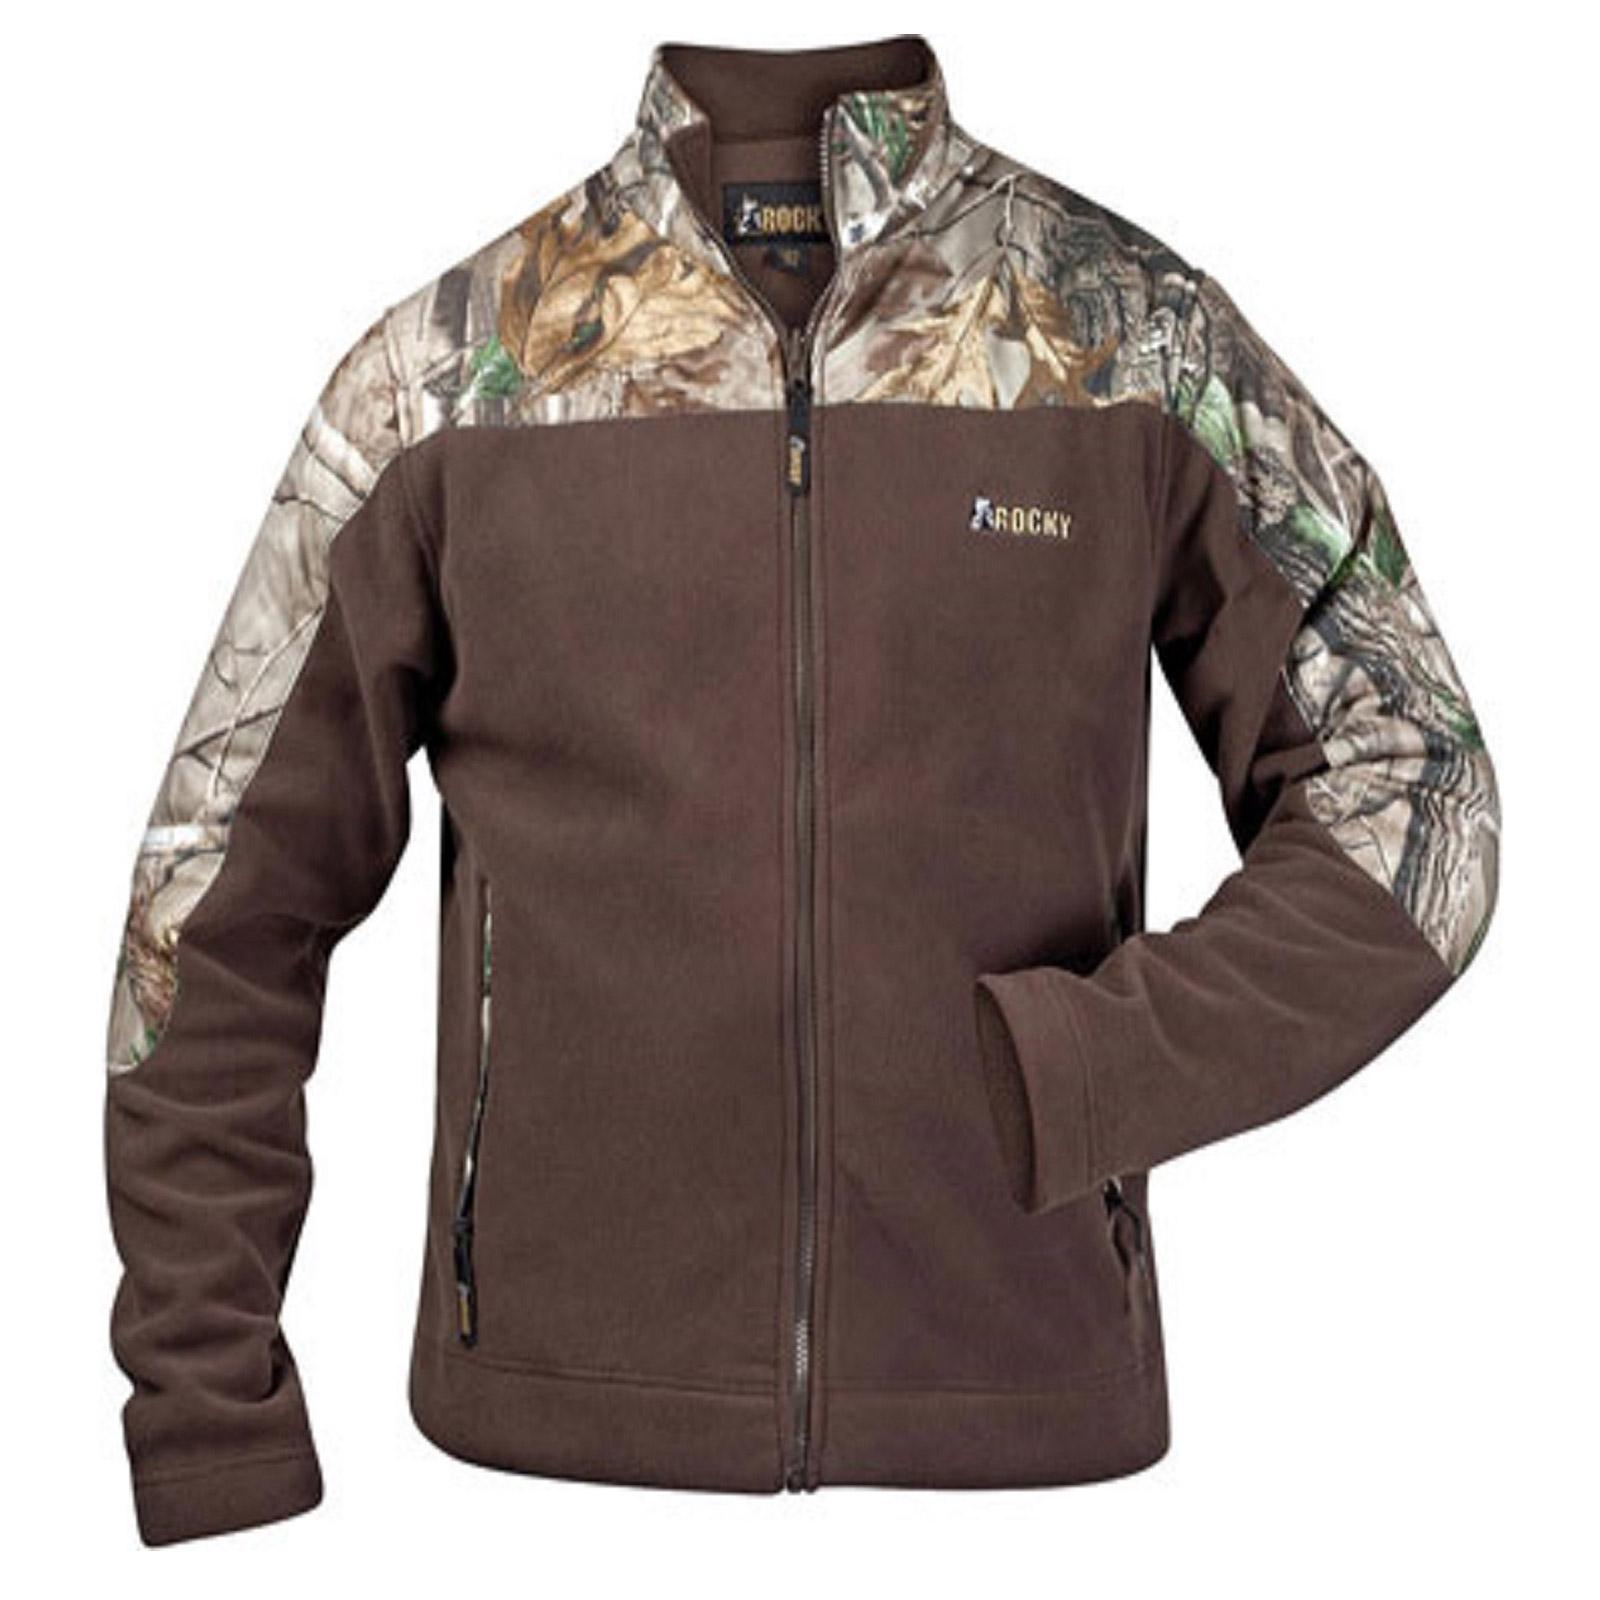 Mens jacket fleece - Instock Rocky 609476 Mens Casual Lifestyle Fleece Jacket